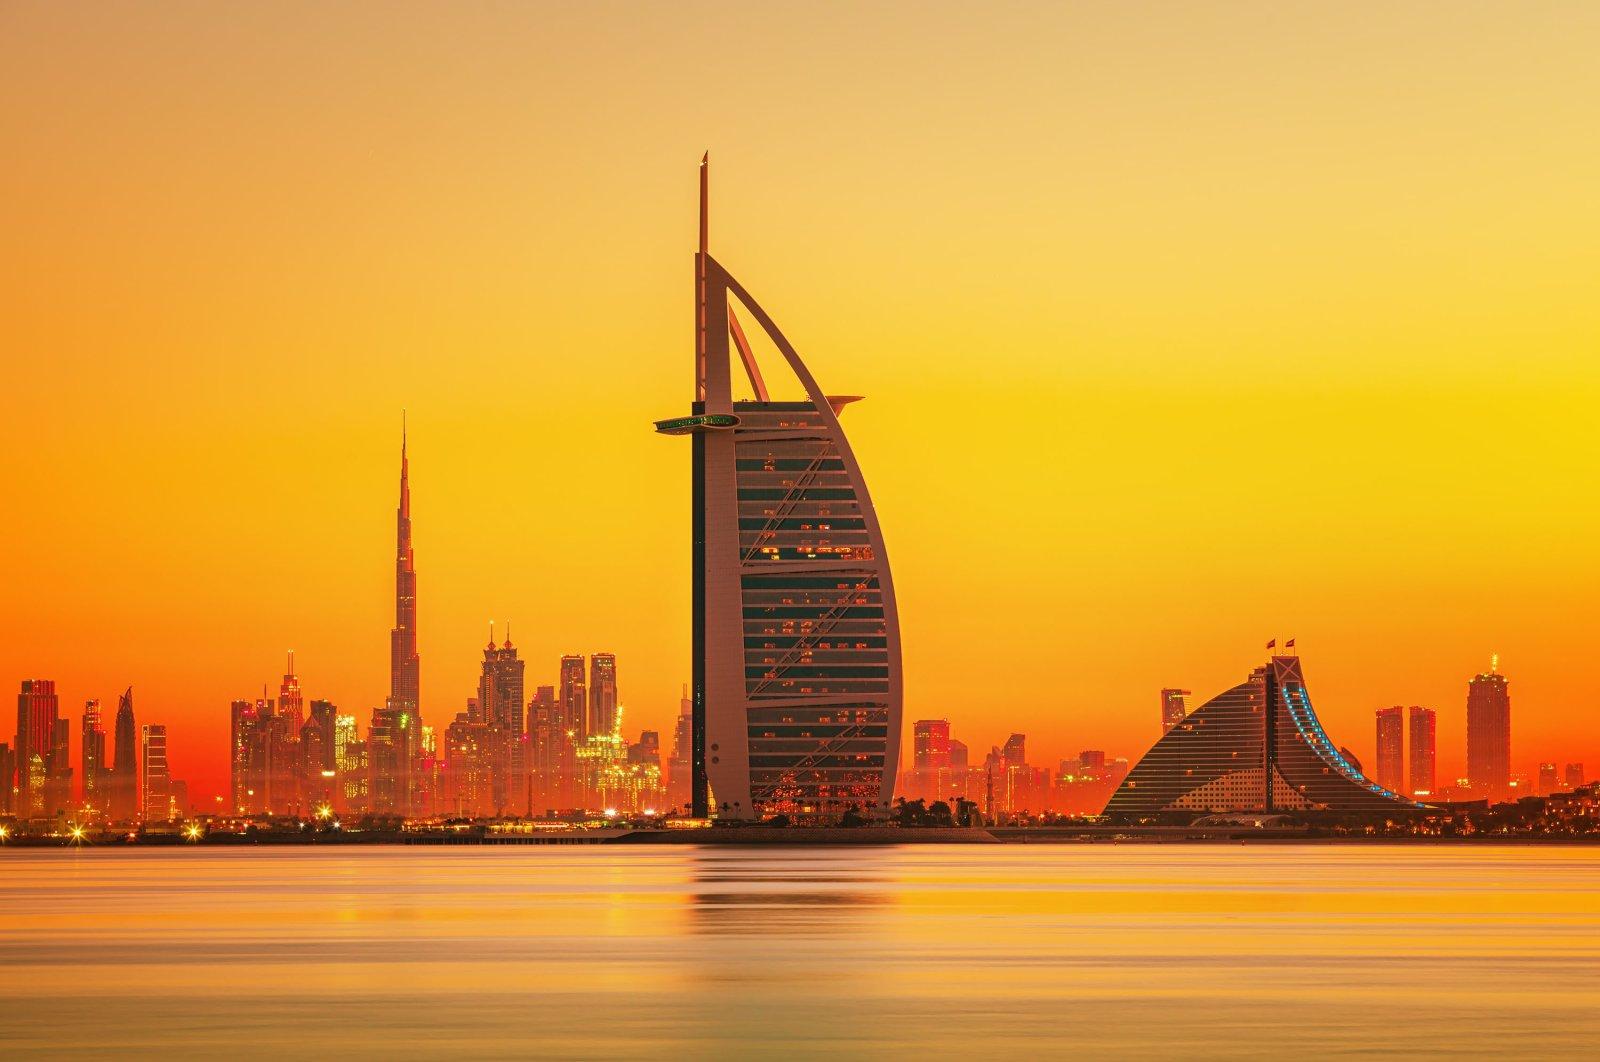 Dubai city skyline view with iconic skyscrapers Burj Khalifa and Burj Al Arab, United Arab Emirates, Dec. 26, 2019. (Shutterstock Photo)